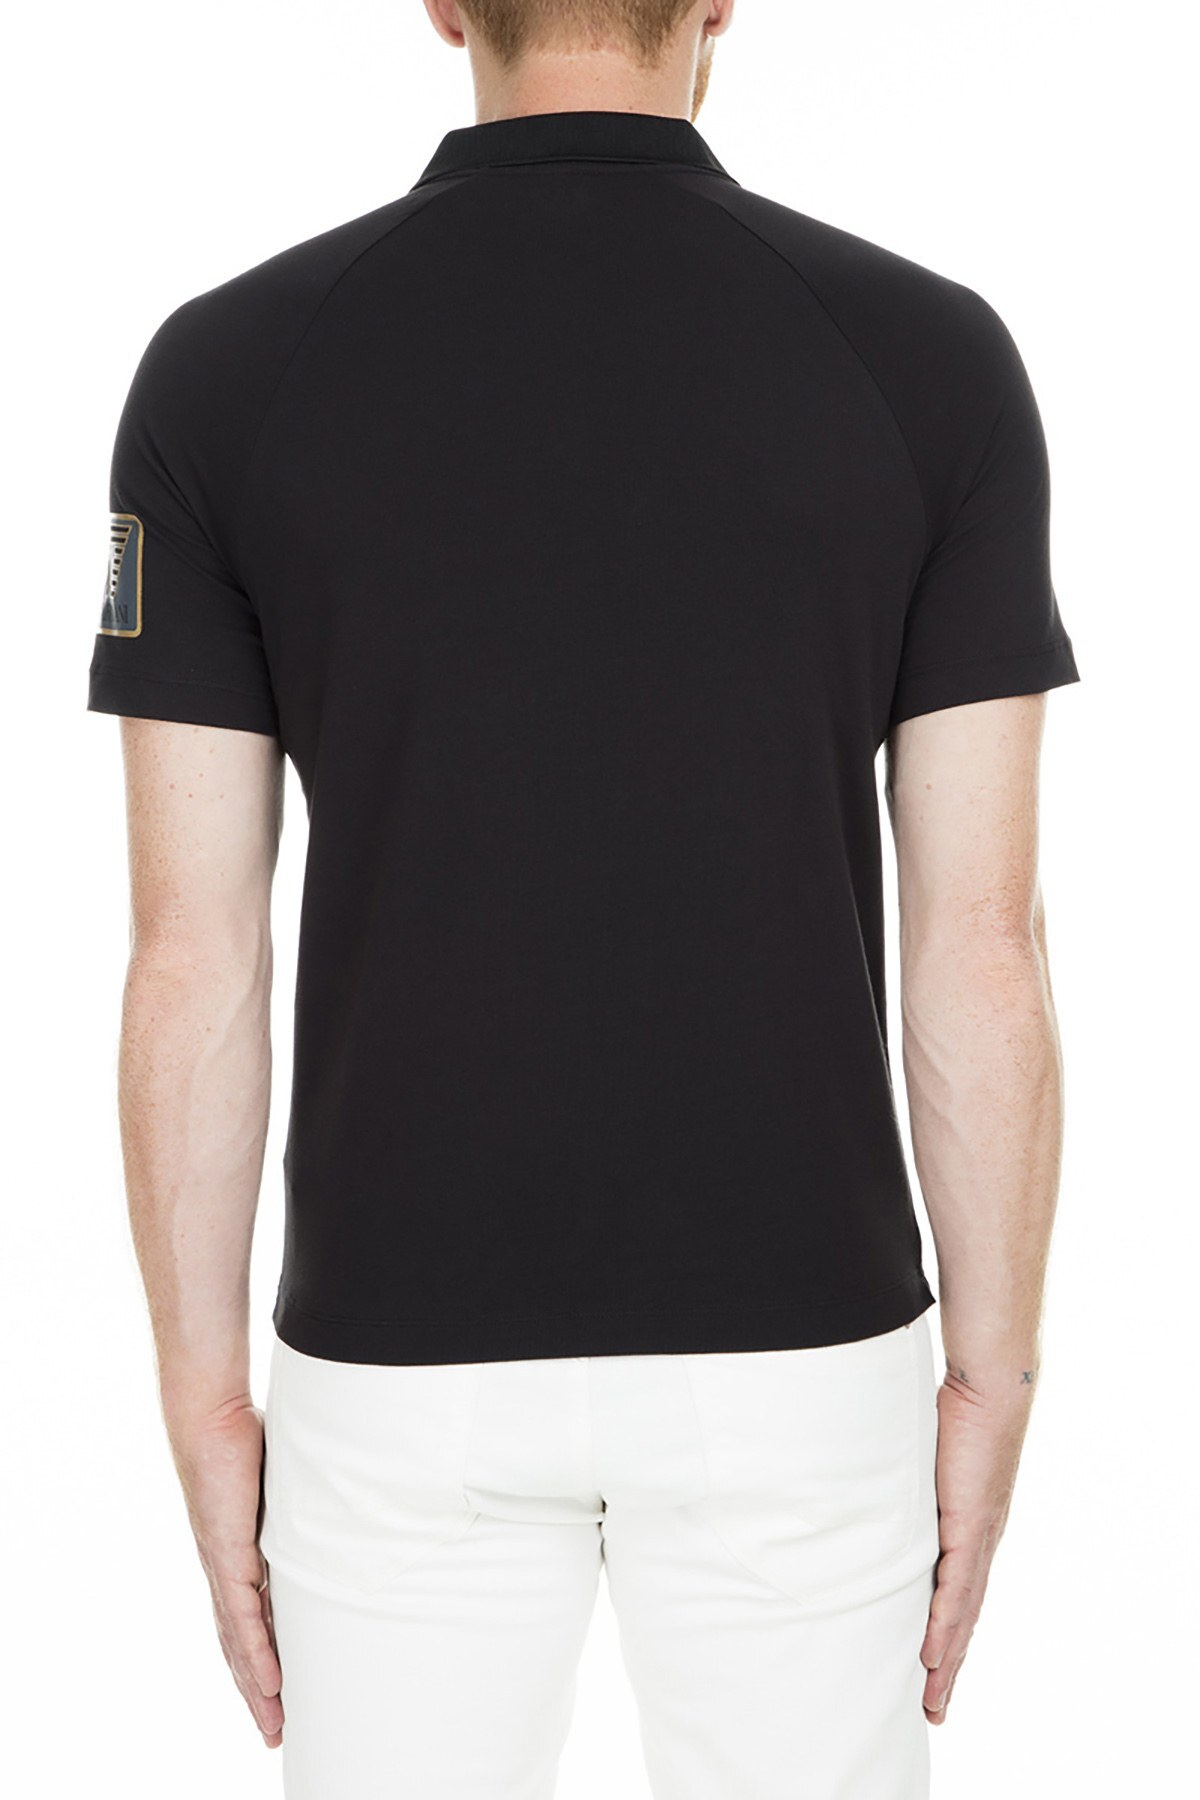 EA7 Polo Erkek T Shirt 6ZPF56 PJ03Z 1200 SİYAH